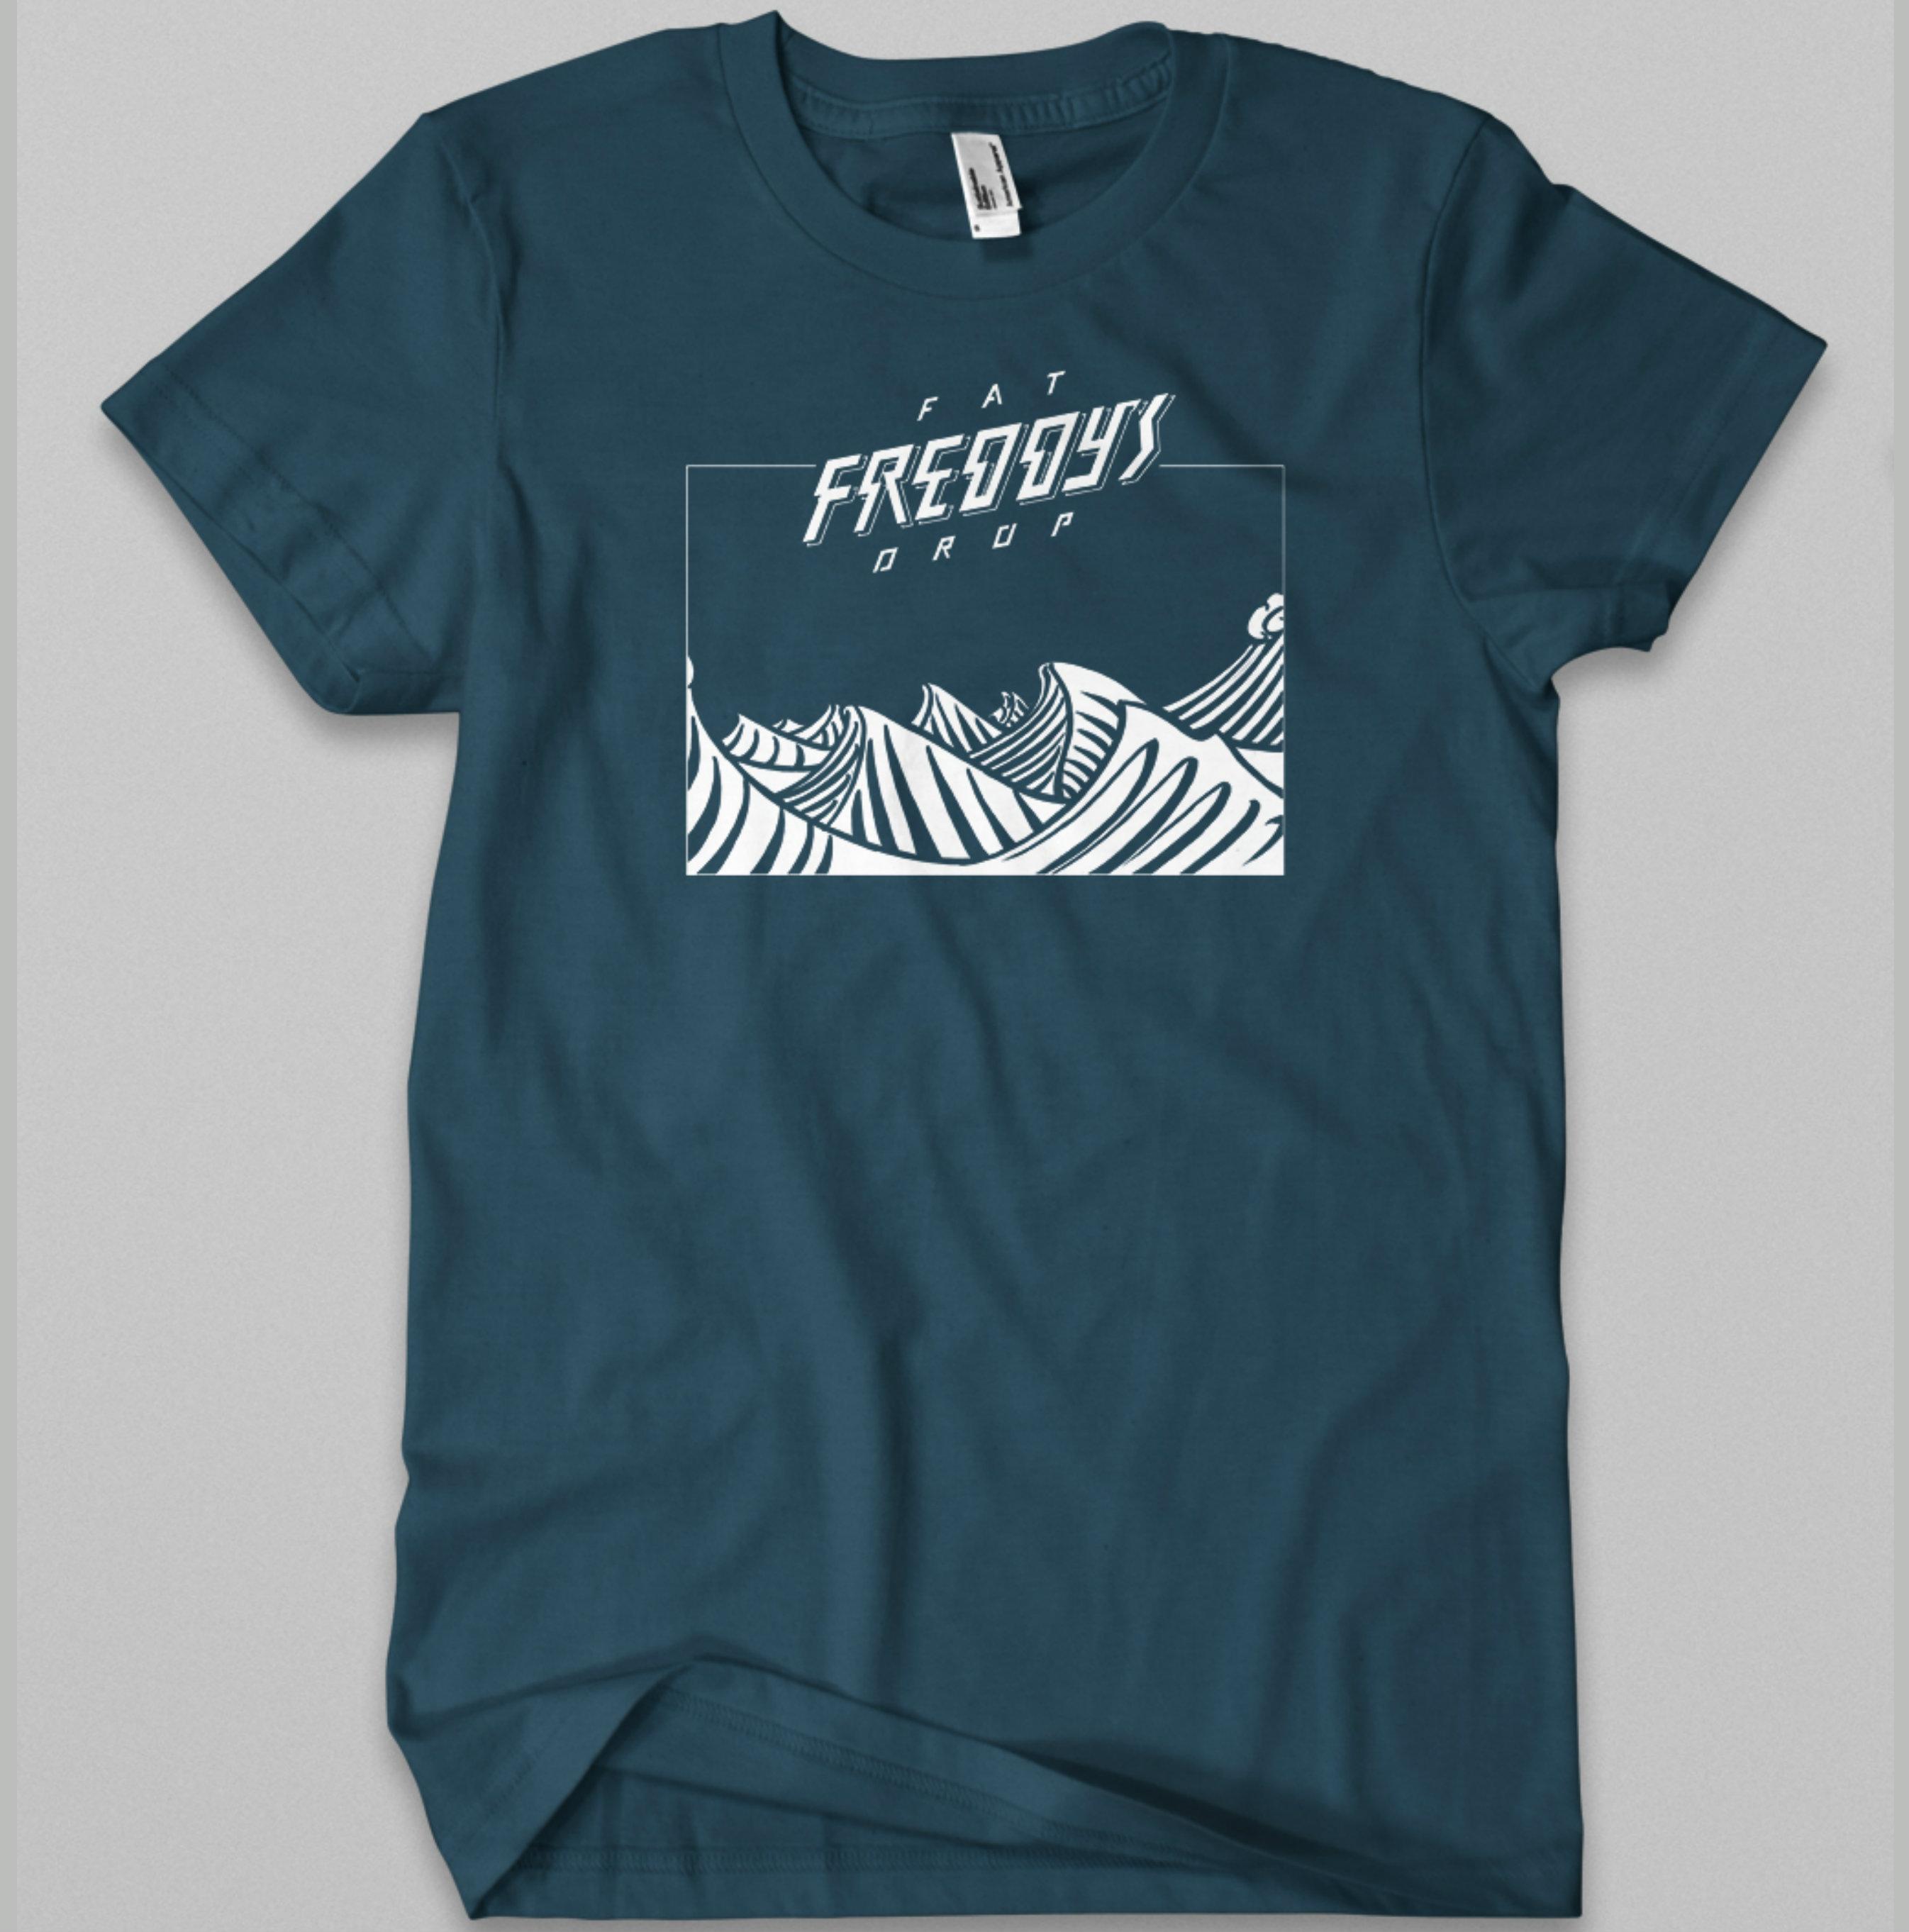 Waves T-shirt - Fat Freddy's Drop